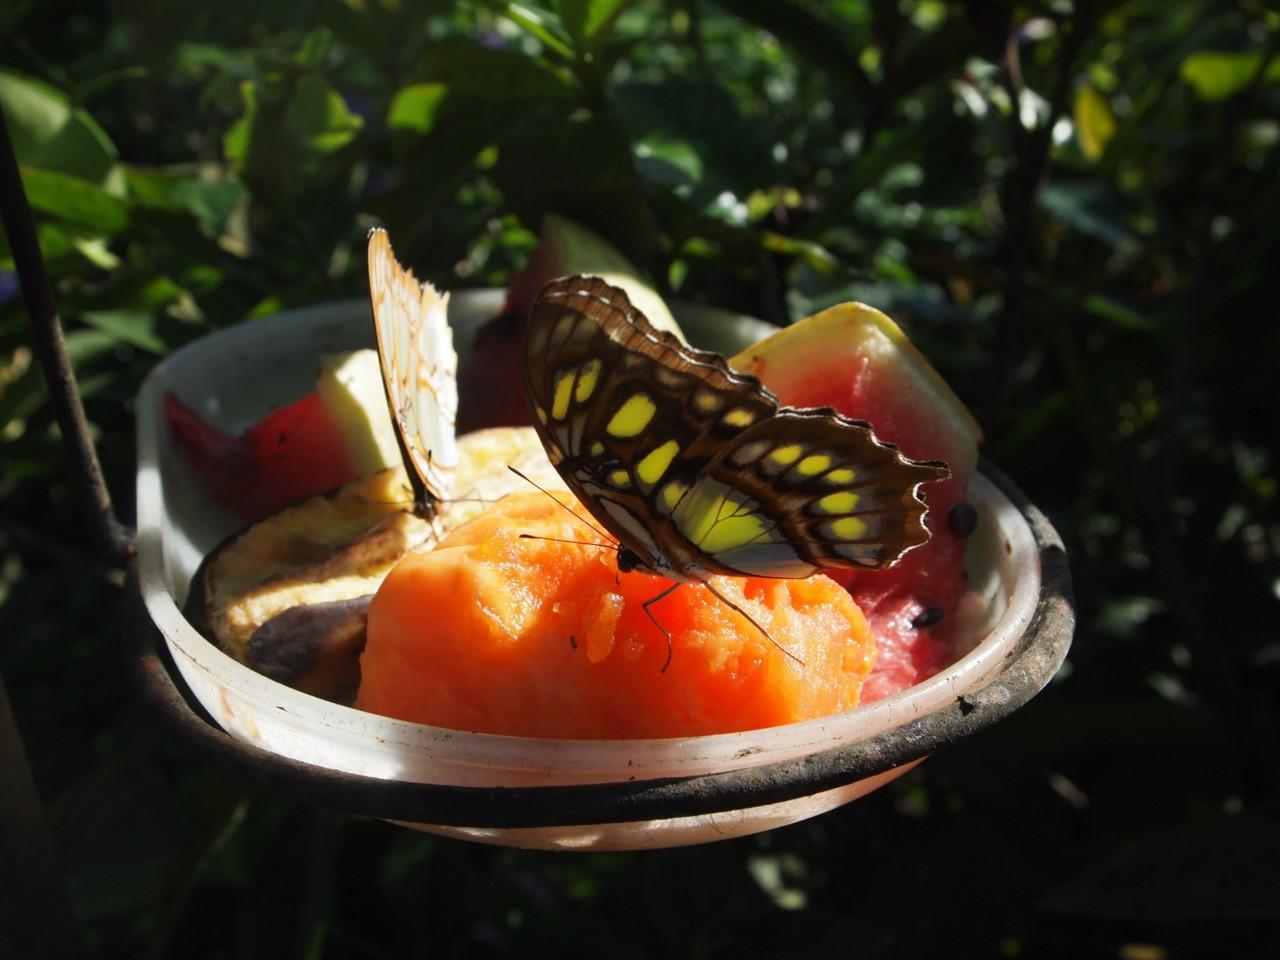 Ausflug zur Schmetterlingsfarm